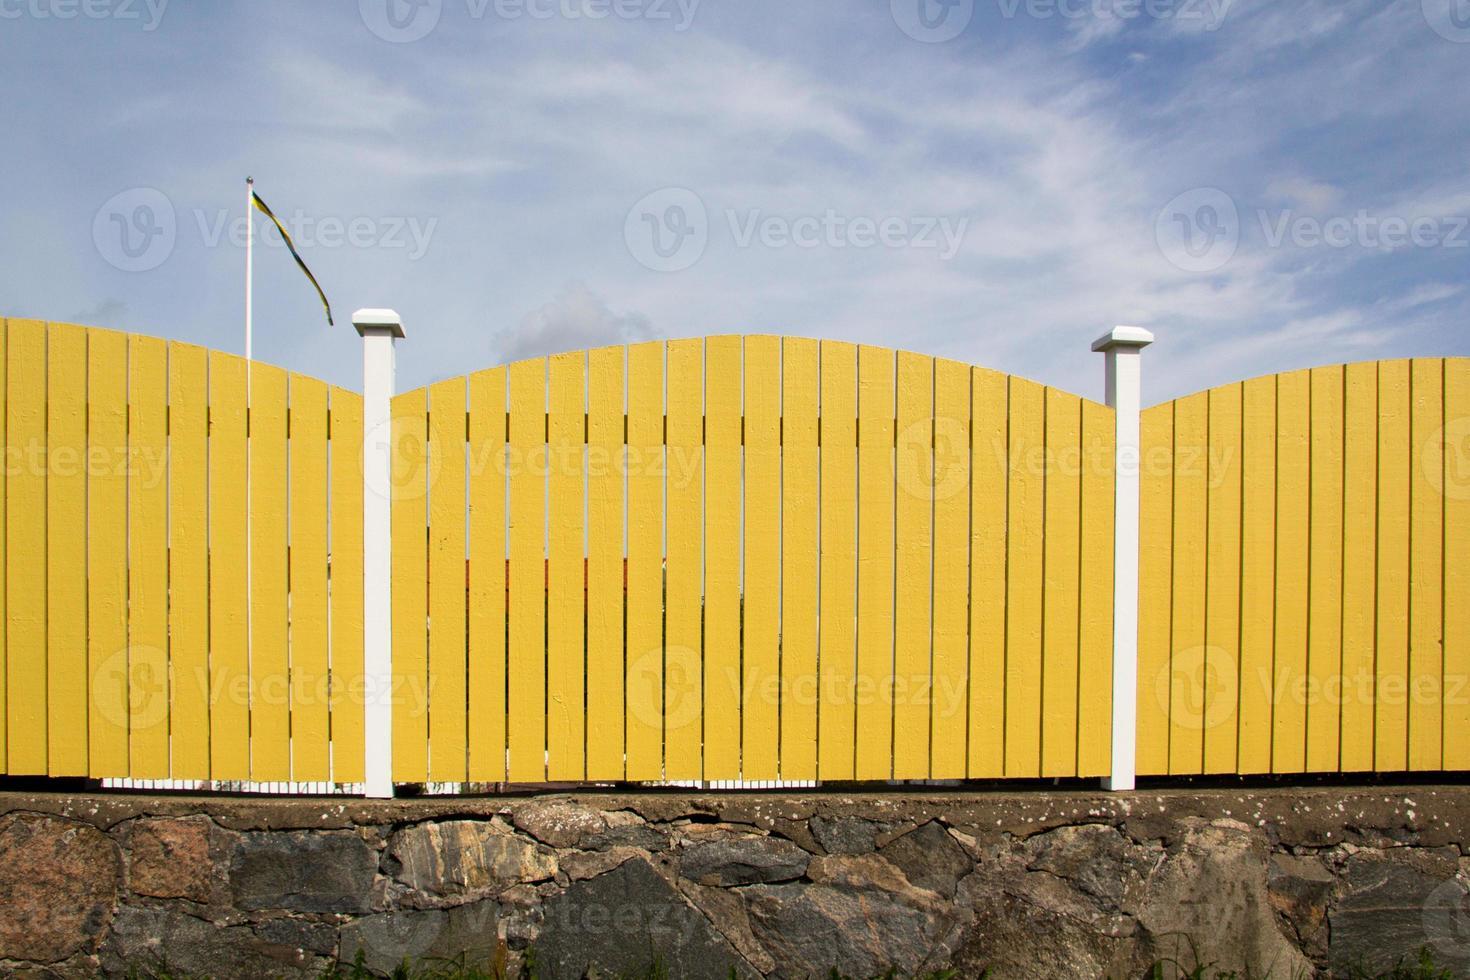 svenska plankorstaket foto